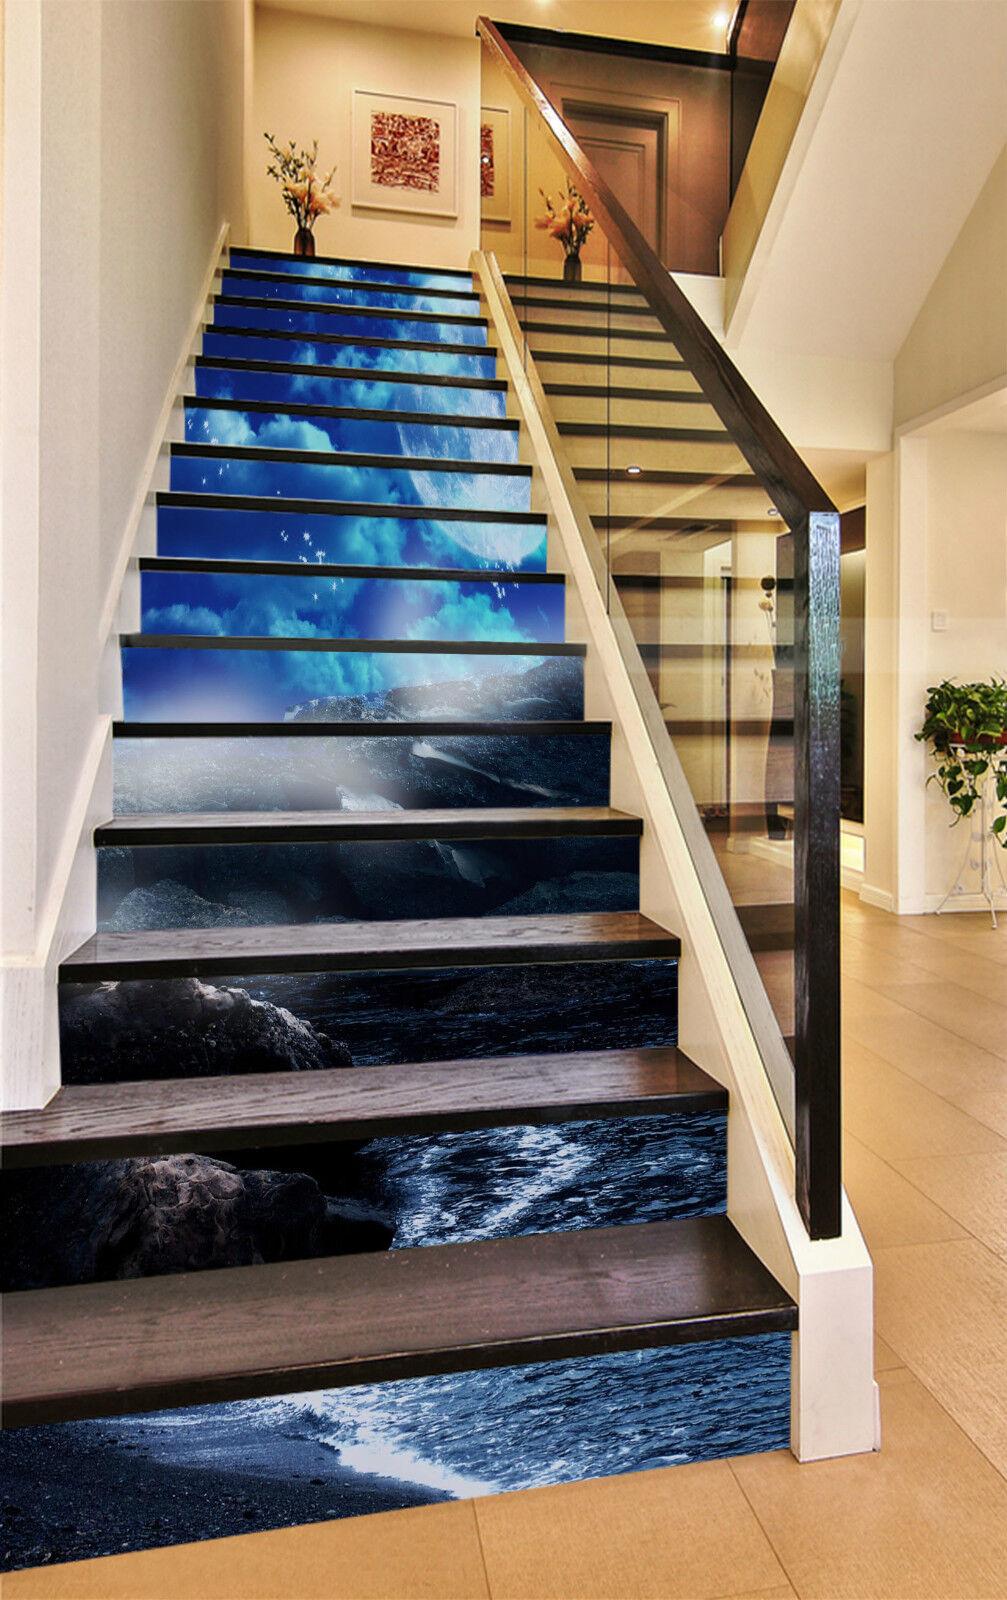 3D Meer Mond 018 Stair Risers Dekoration Fototapete Vinyl Aufkleber Tapete DE